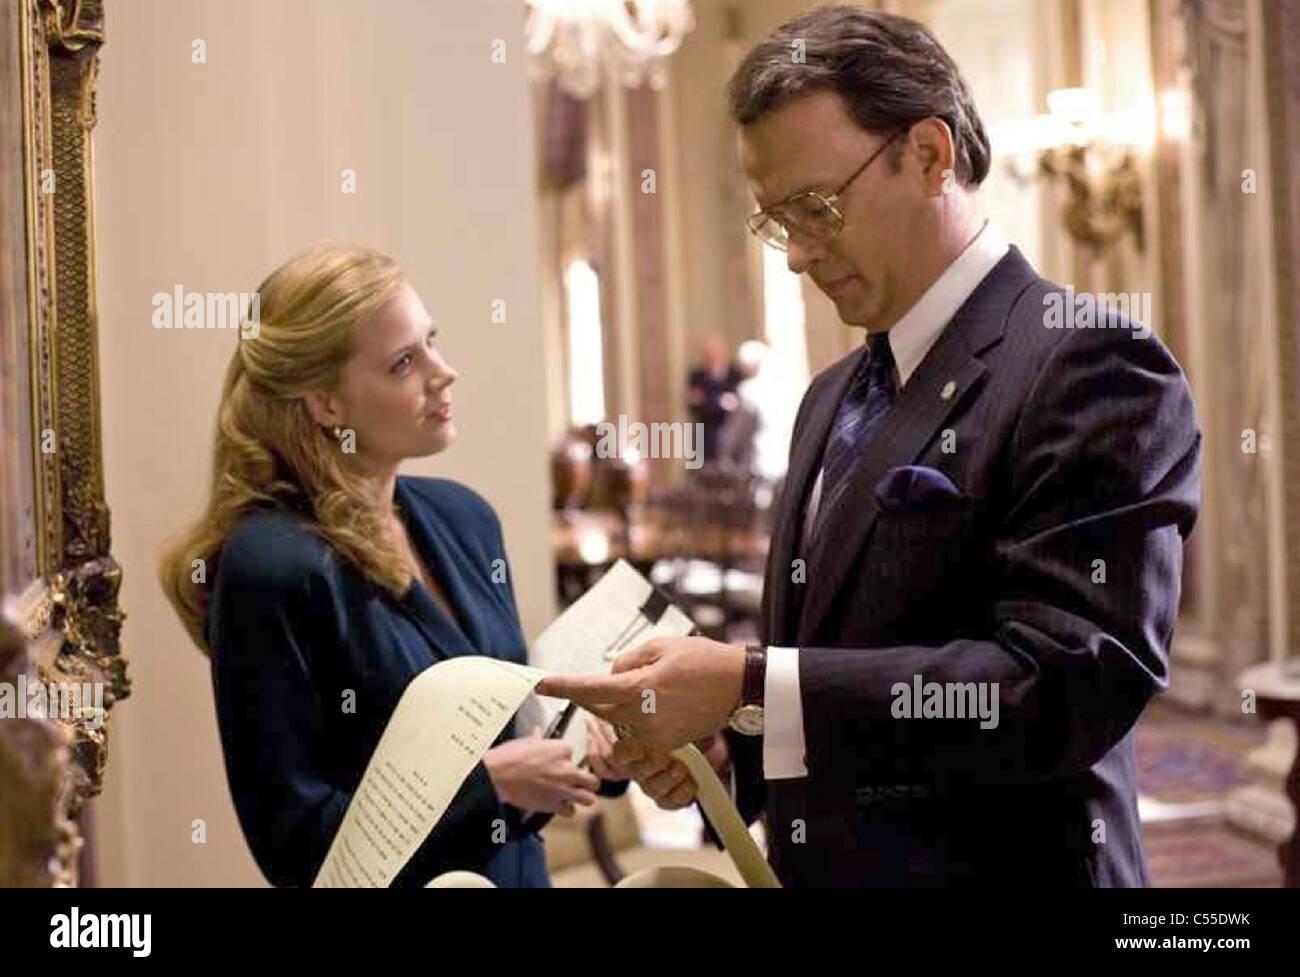 CHARLIE WILSON'S WAR  2007 Universal film with Tom Hanks and Amy Adams - Stock Image